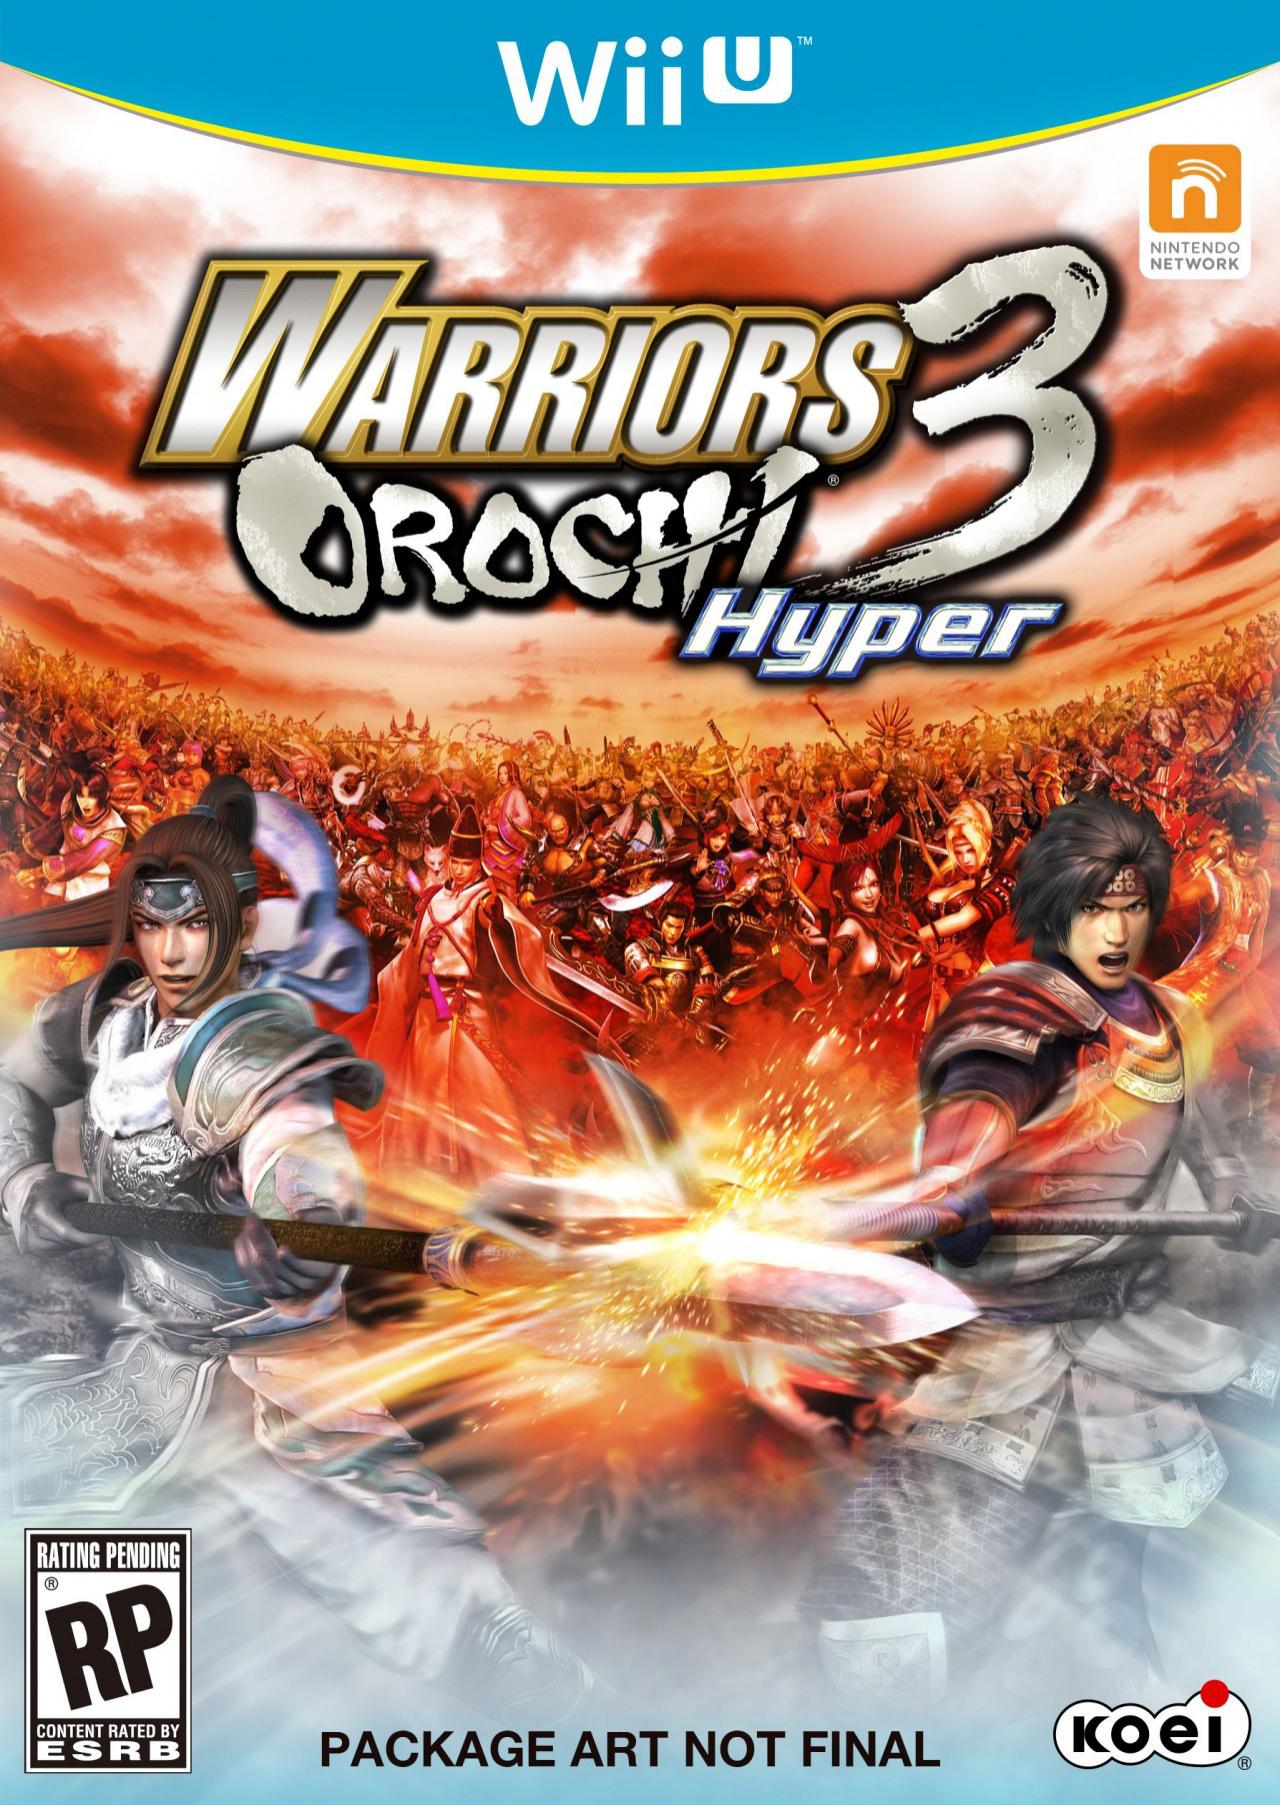 Jeu vidéo Warriors Orochi 3 Hyper sur Wii U